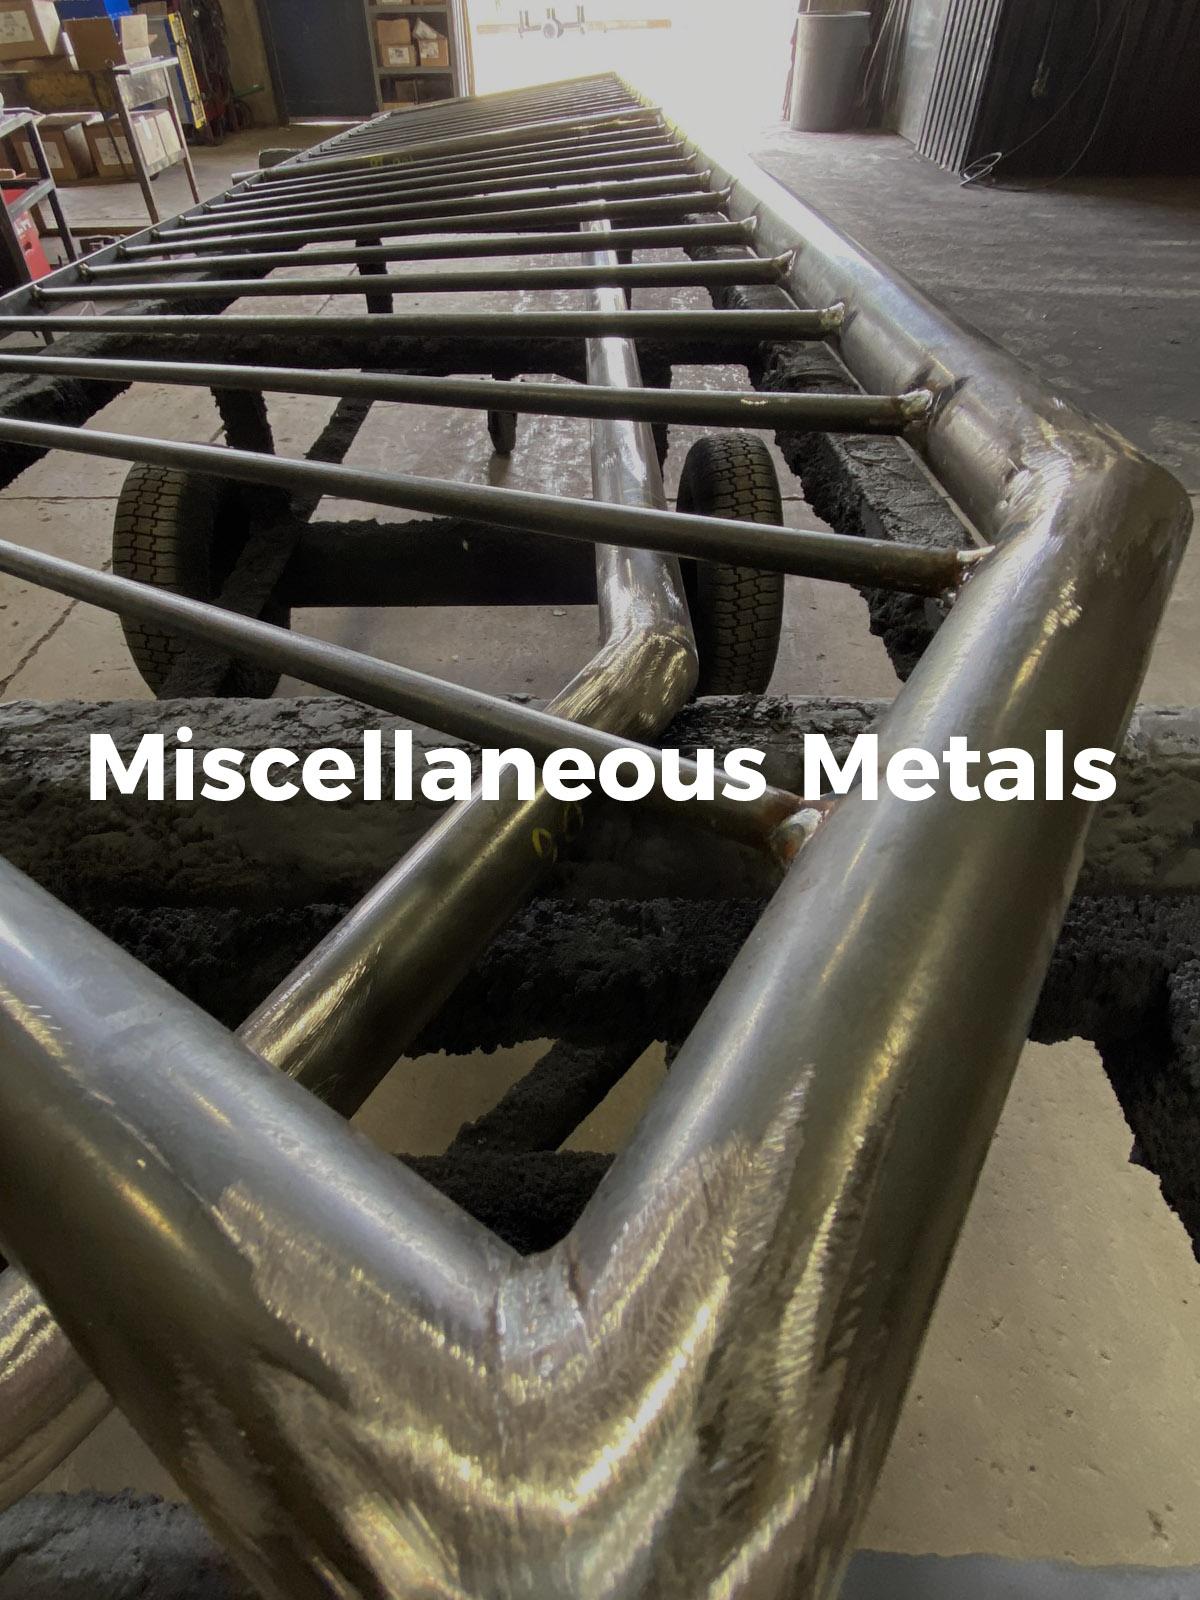 Miscellaneous Metals